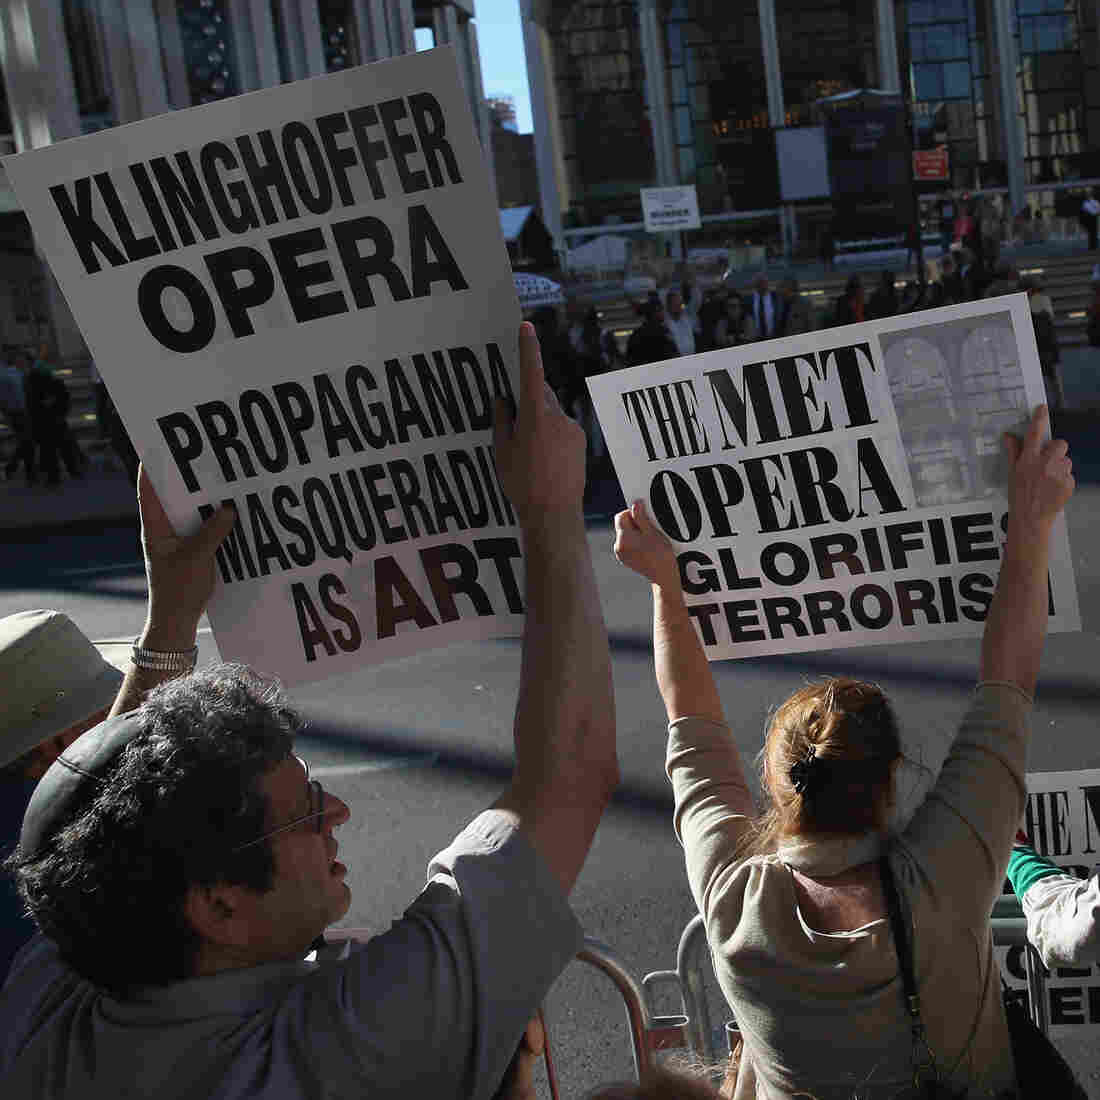 Twenty Years Later, 'Klinghoffer' Still Draws Protests